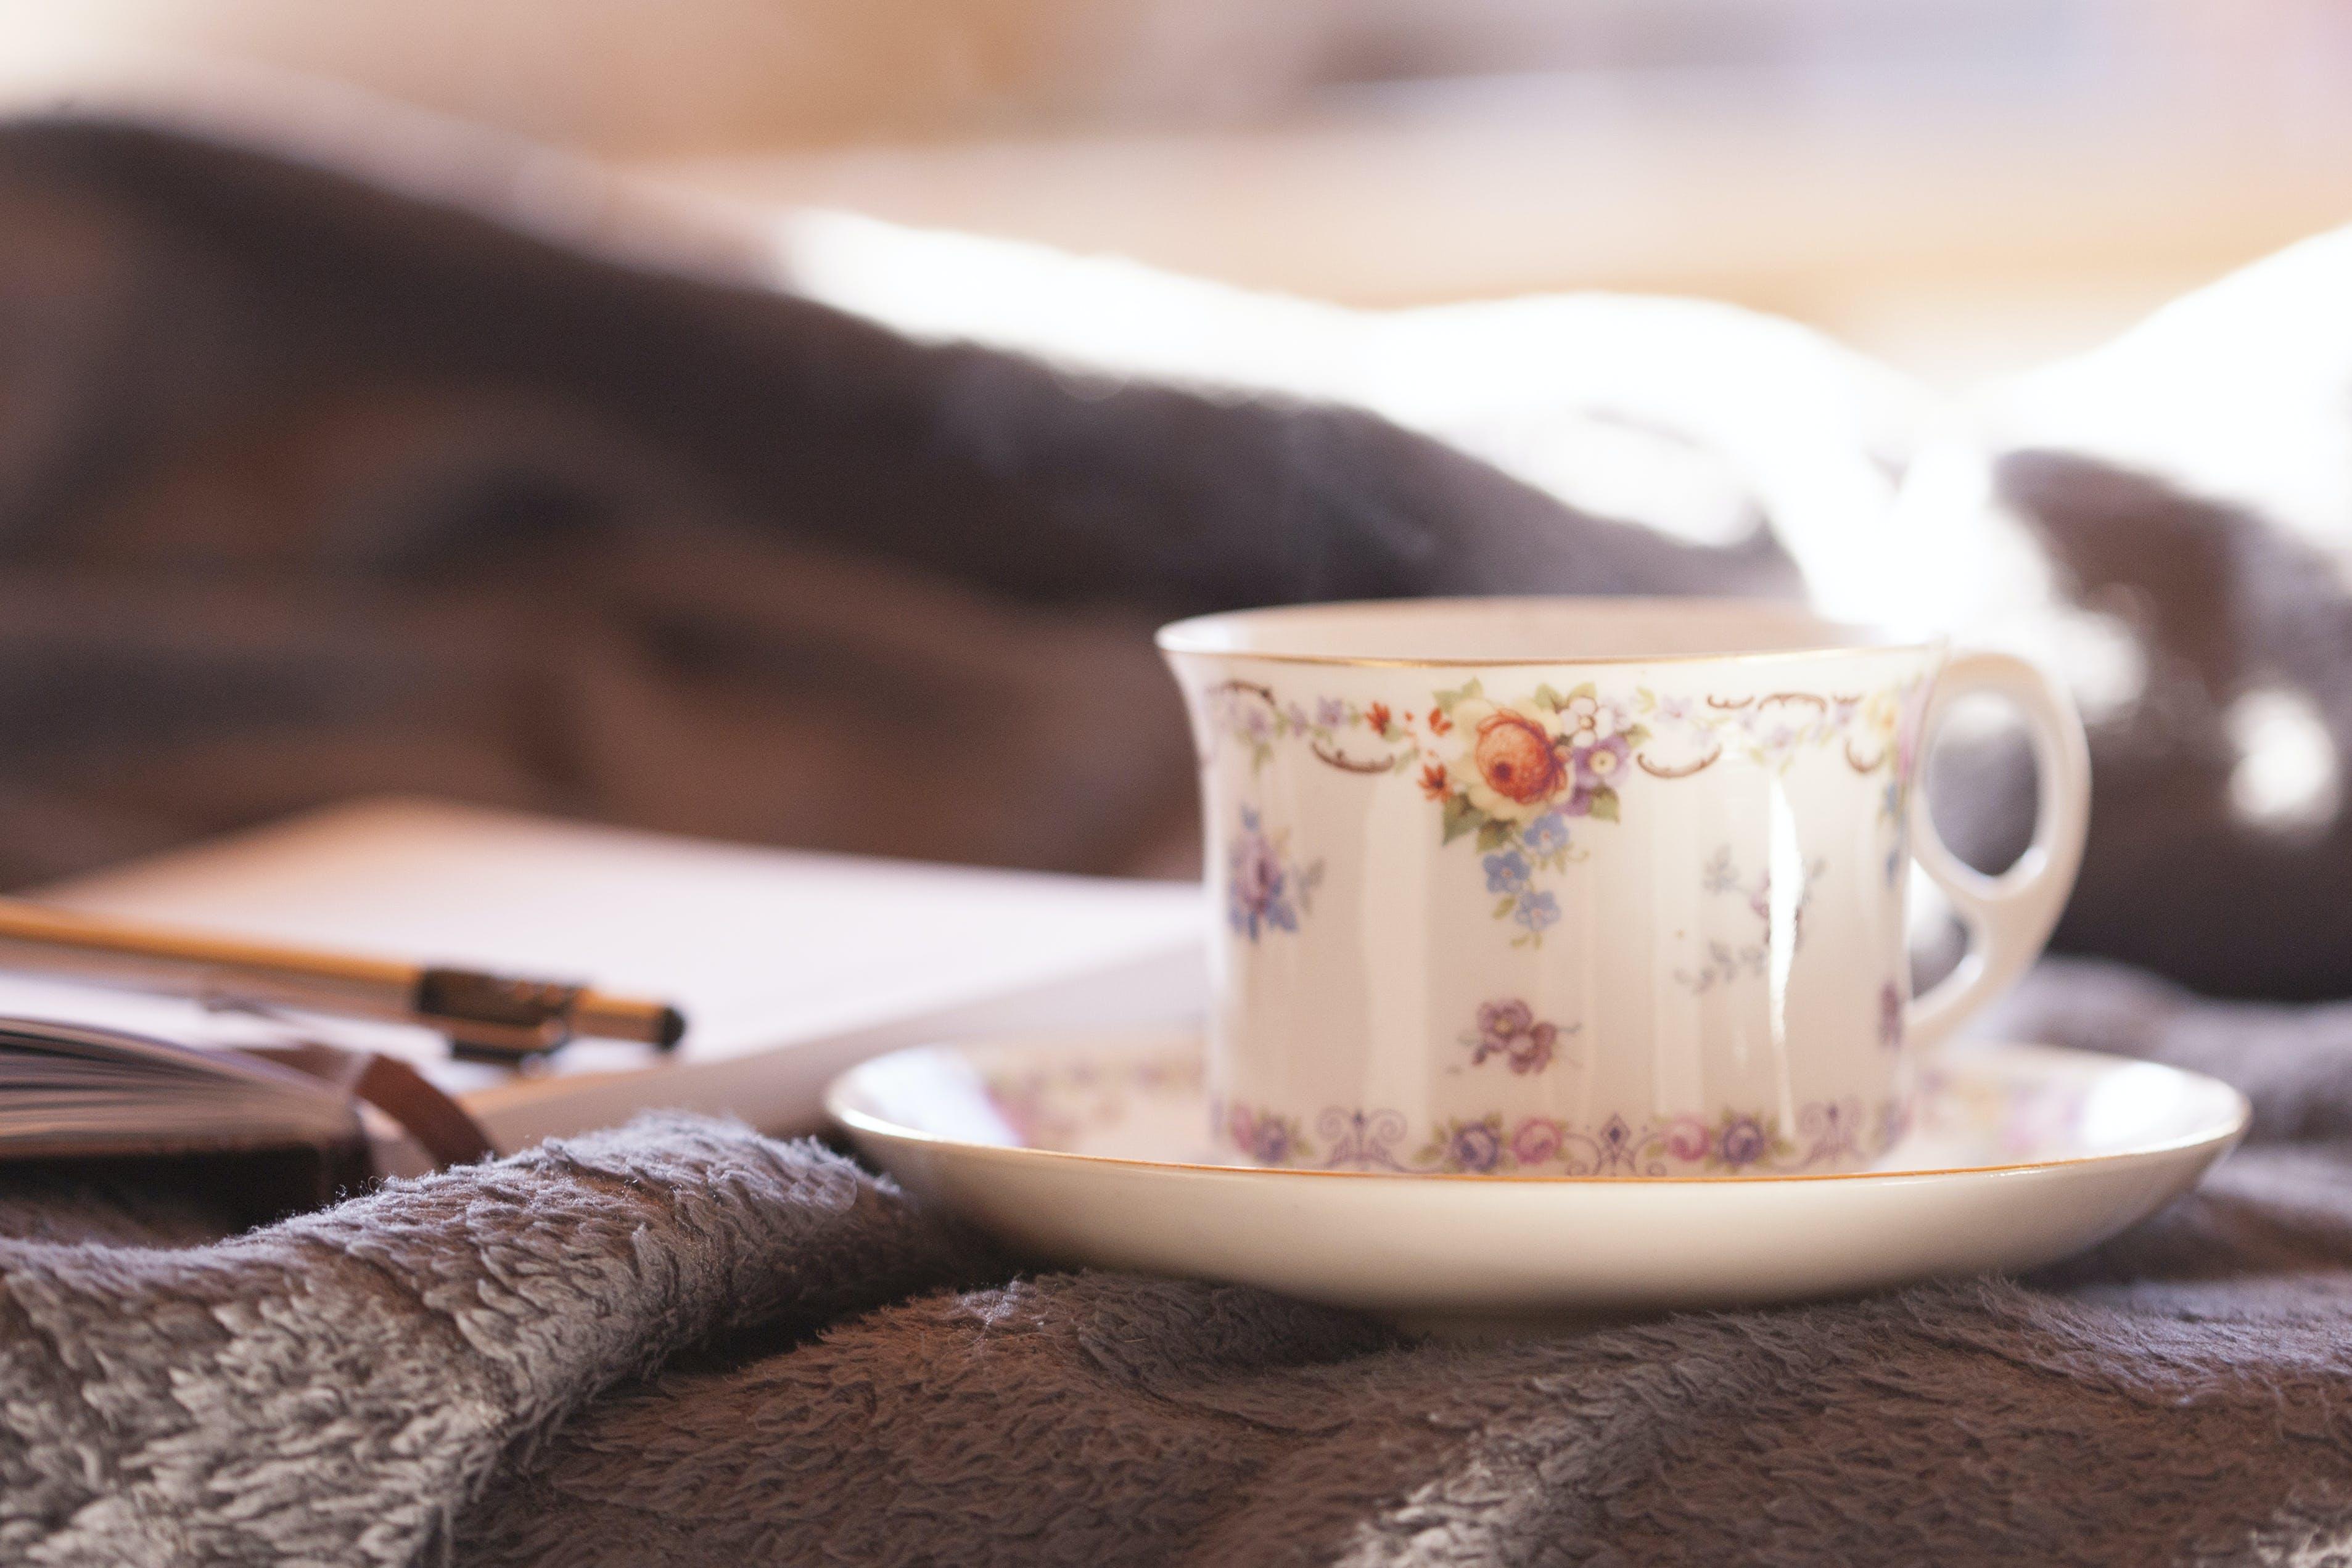 Close-Up Photo of Teacup And Saucer